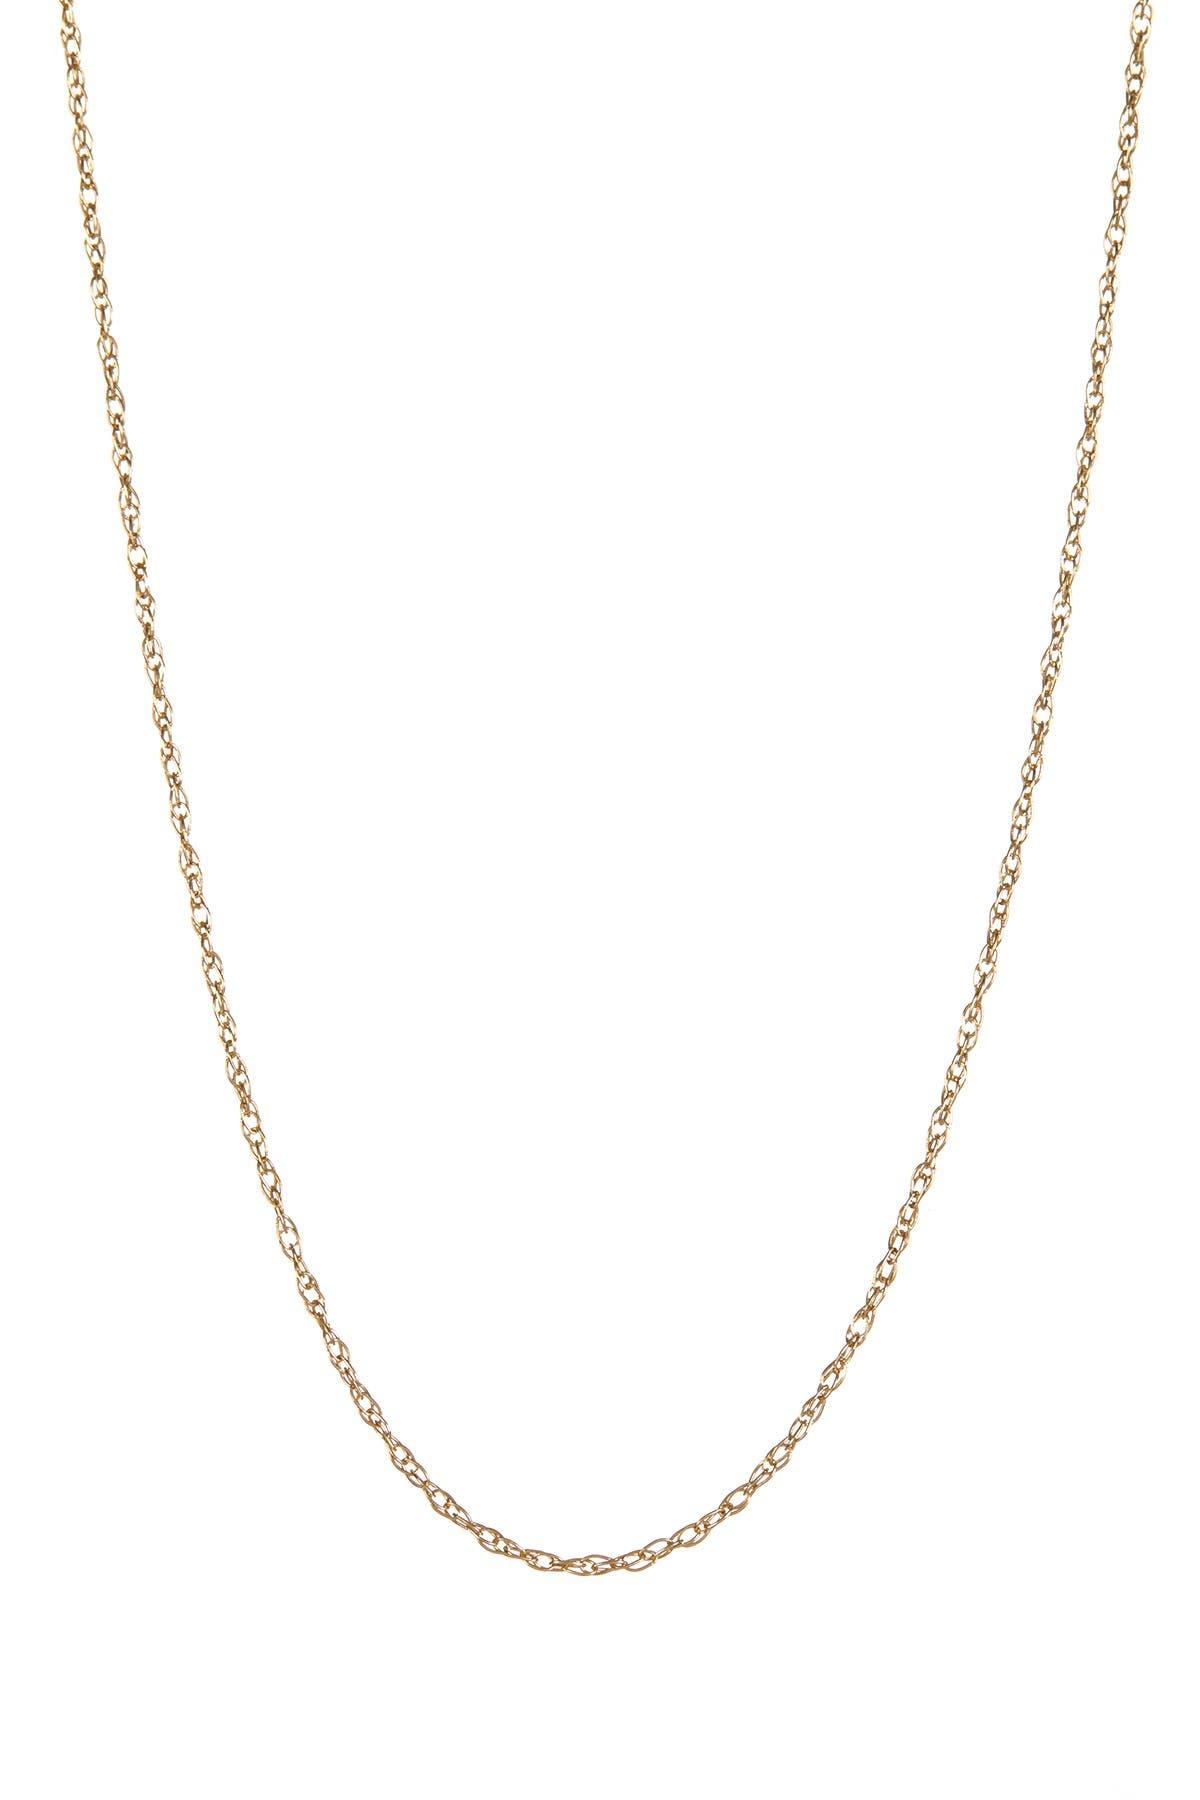 "Image of KARAT RUSH 14K Yellow Gold Rope 16"" Chain Necklace"